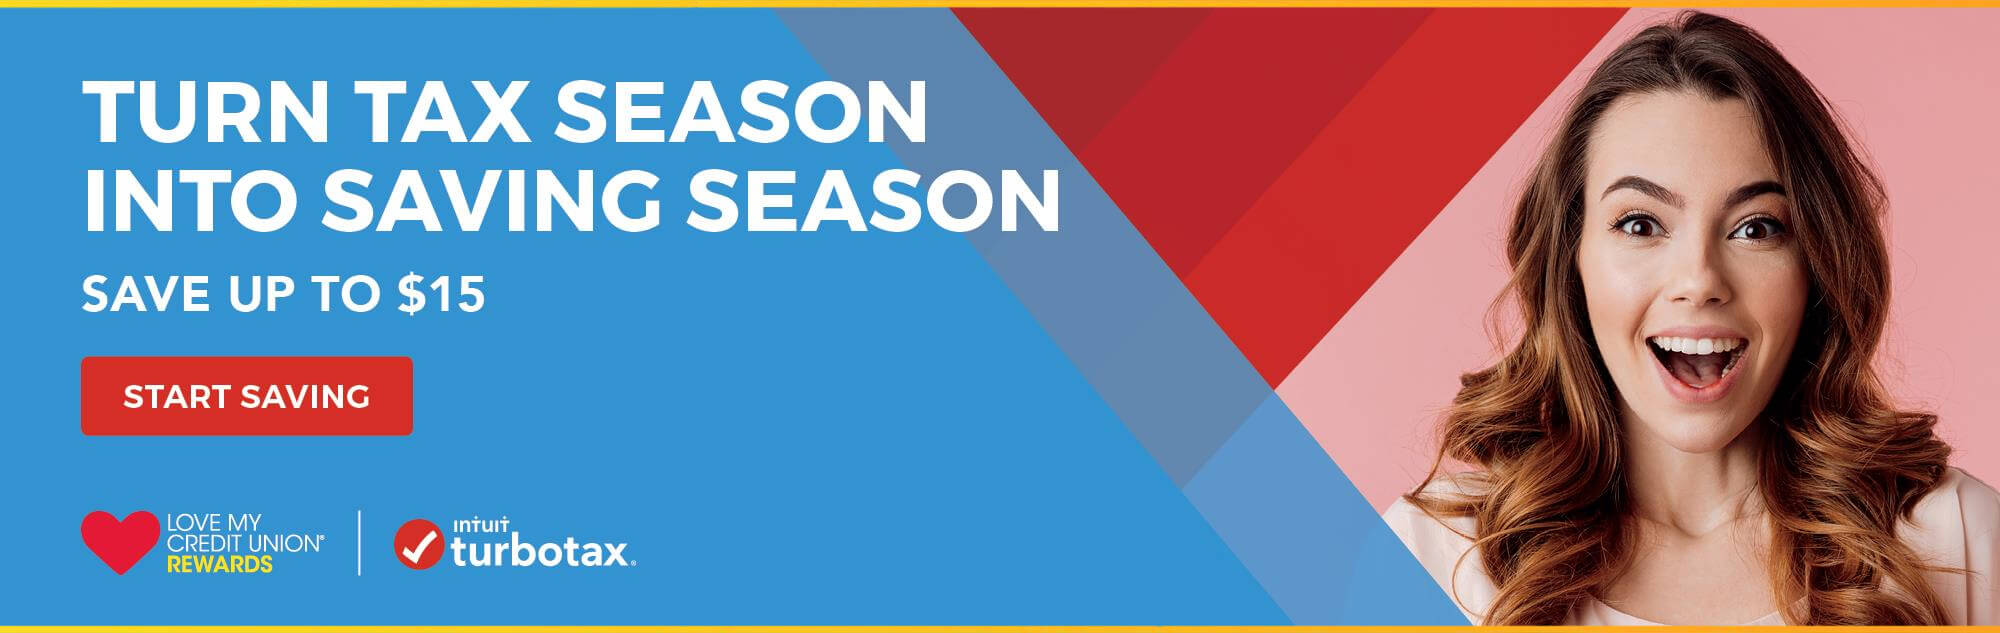 Turn tax season into saving season. Save up to $15 with Intuit Turbo Tax. Click to start saving.